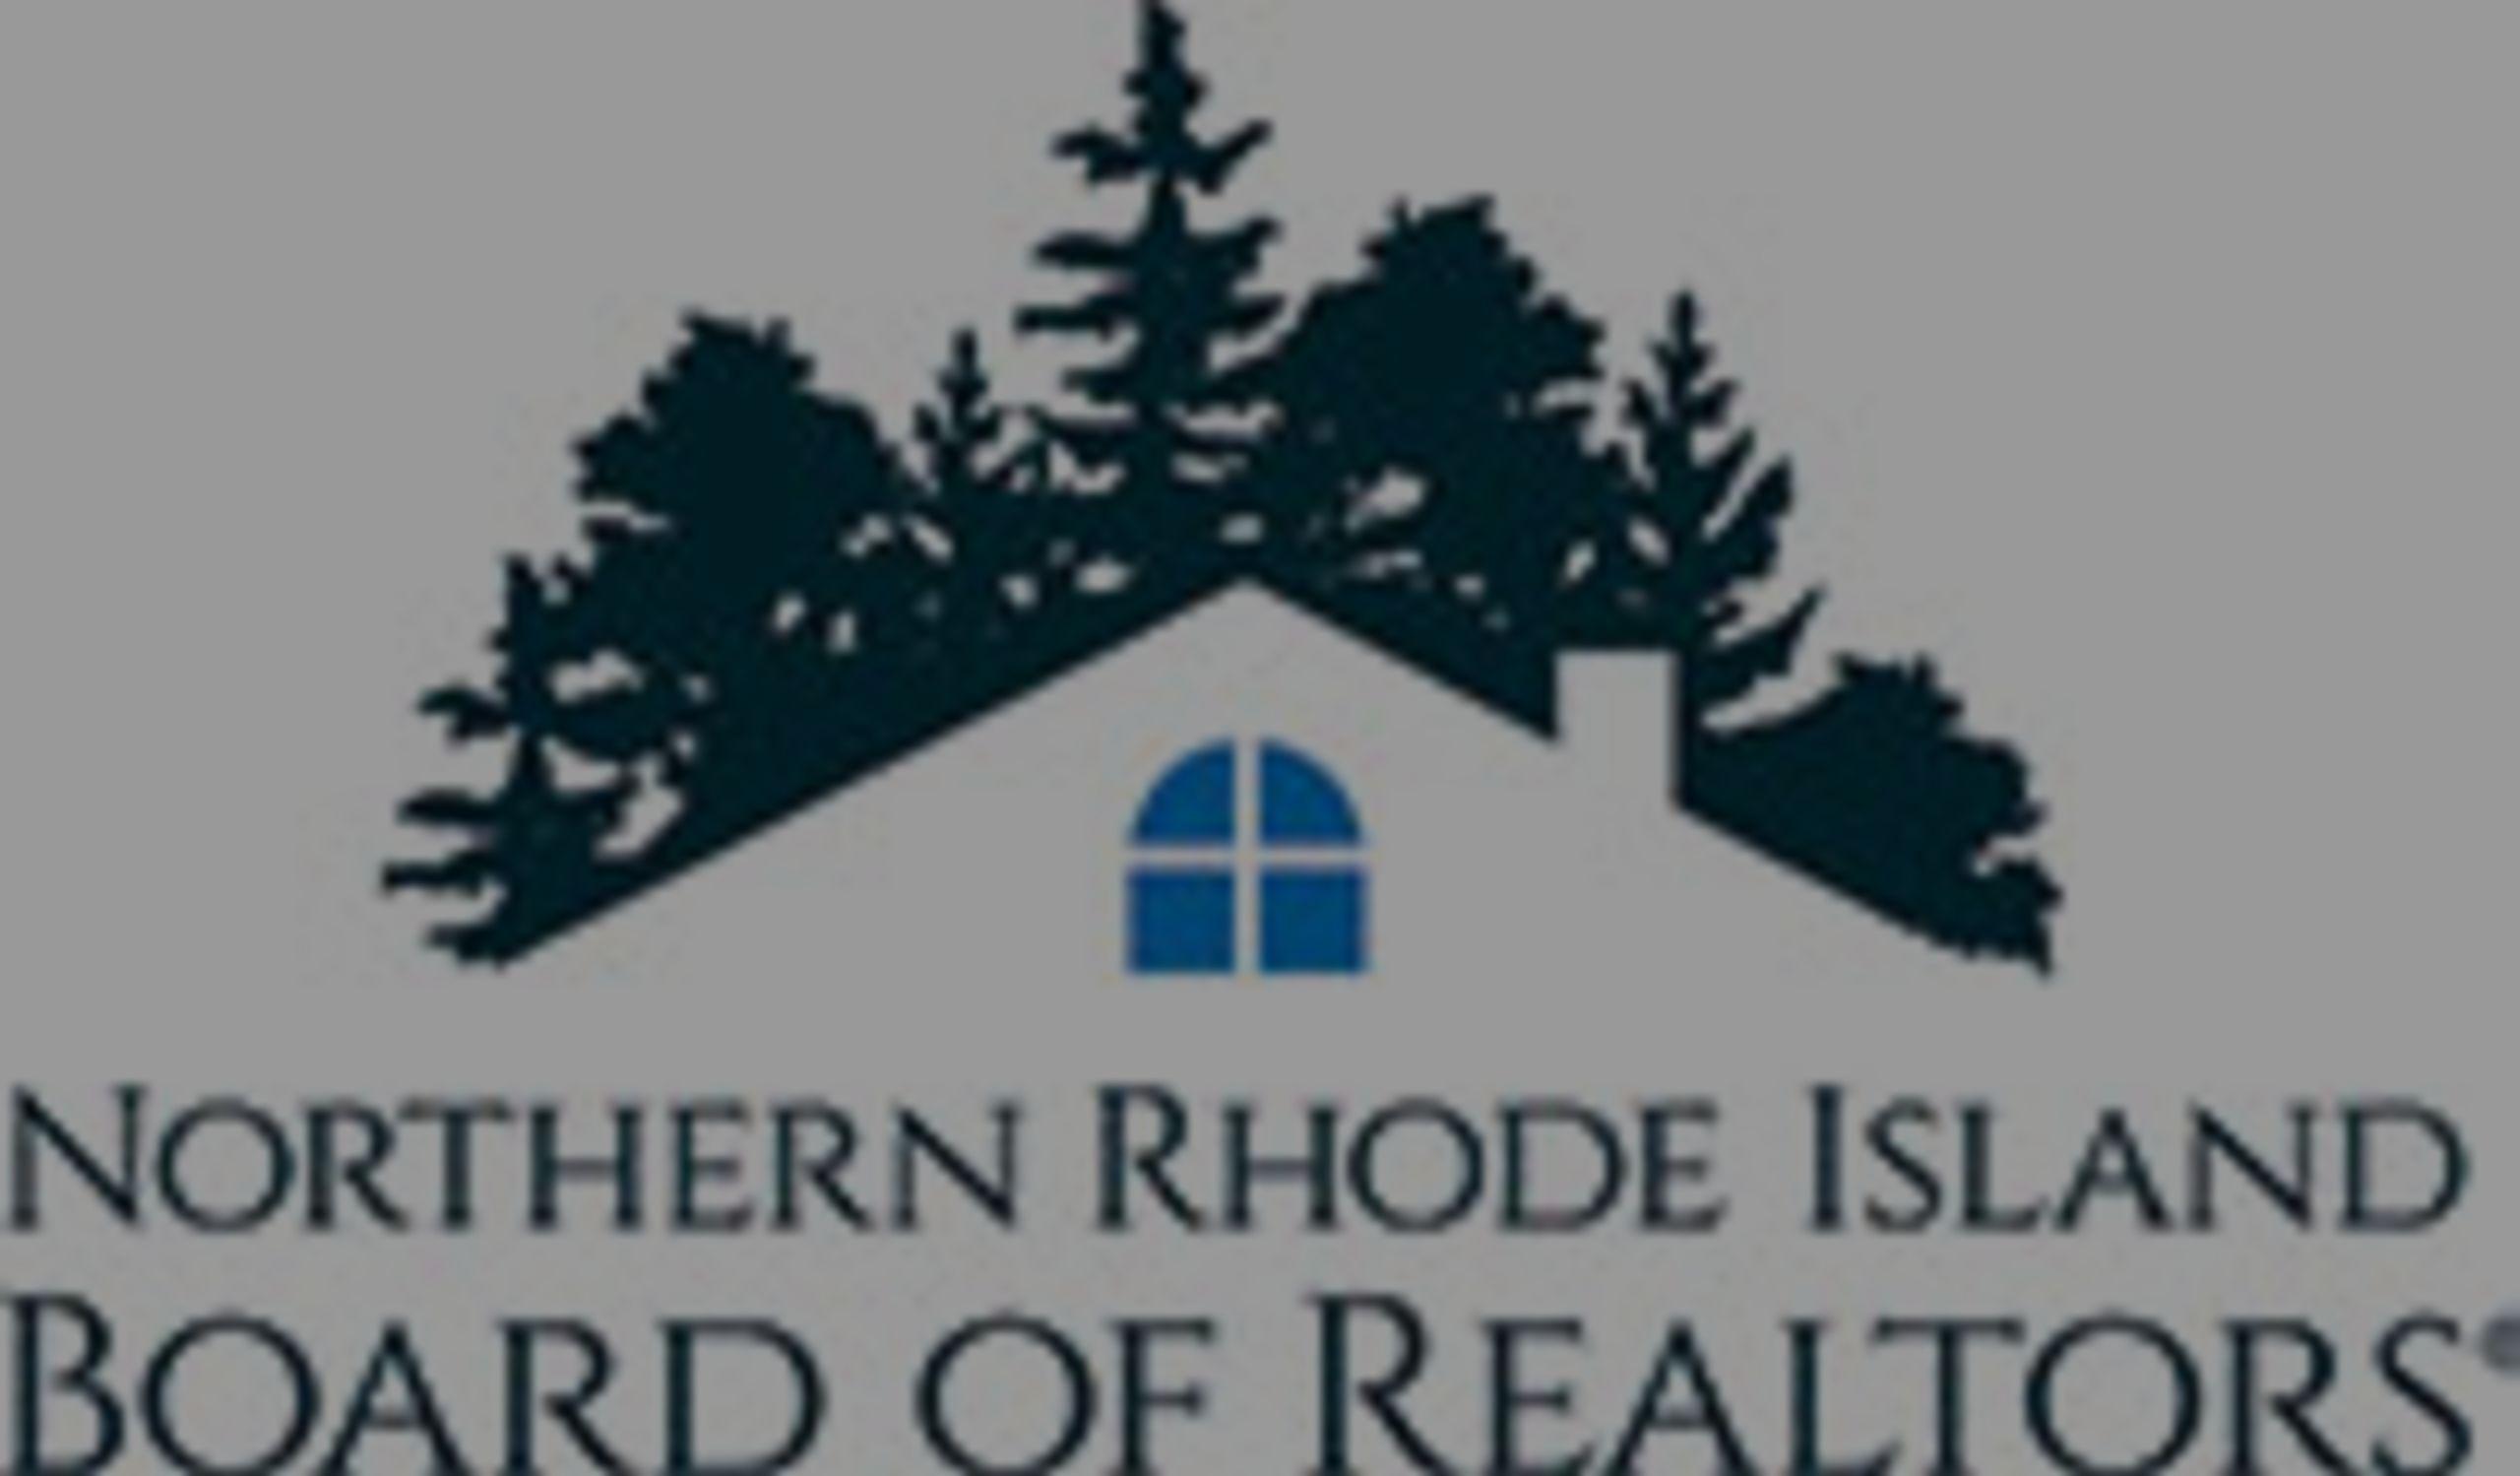 2017 Northern RI Realtor of the Year